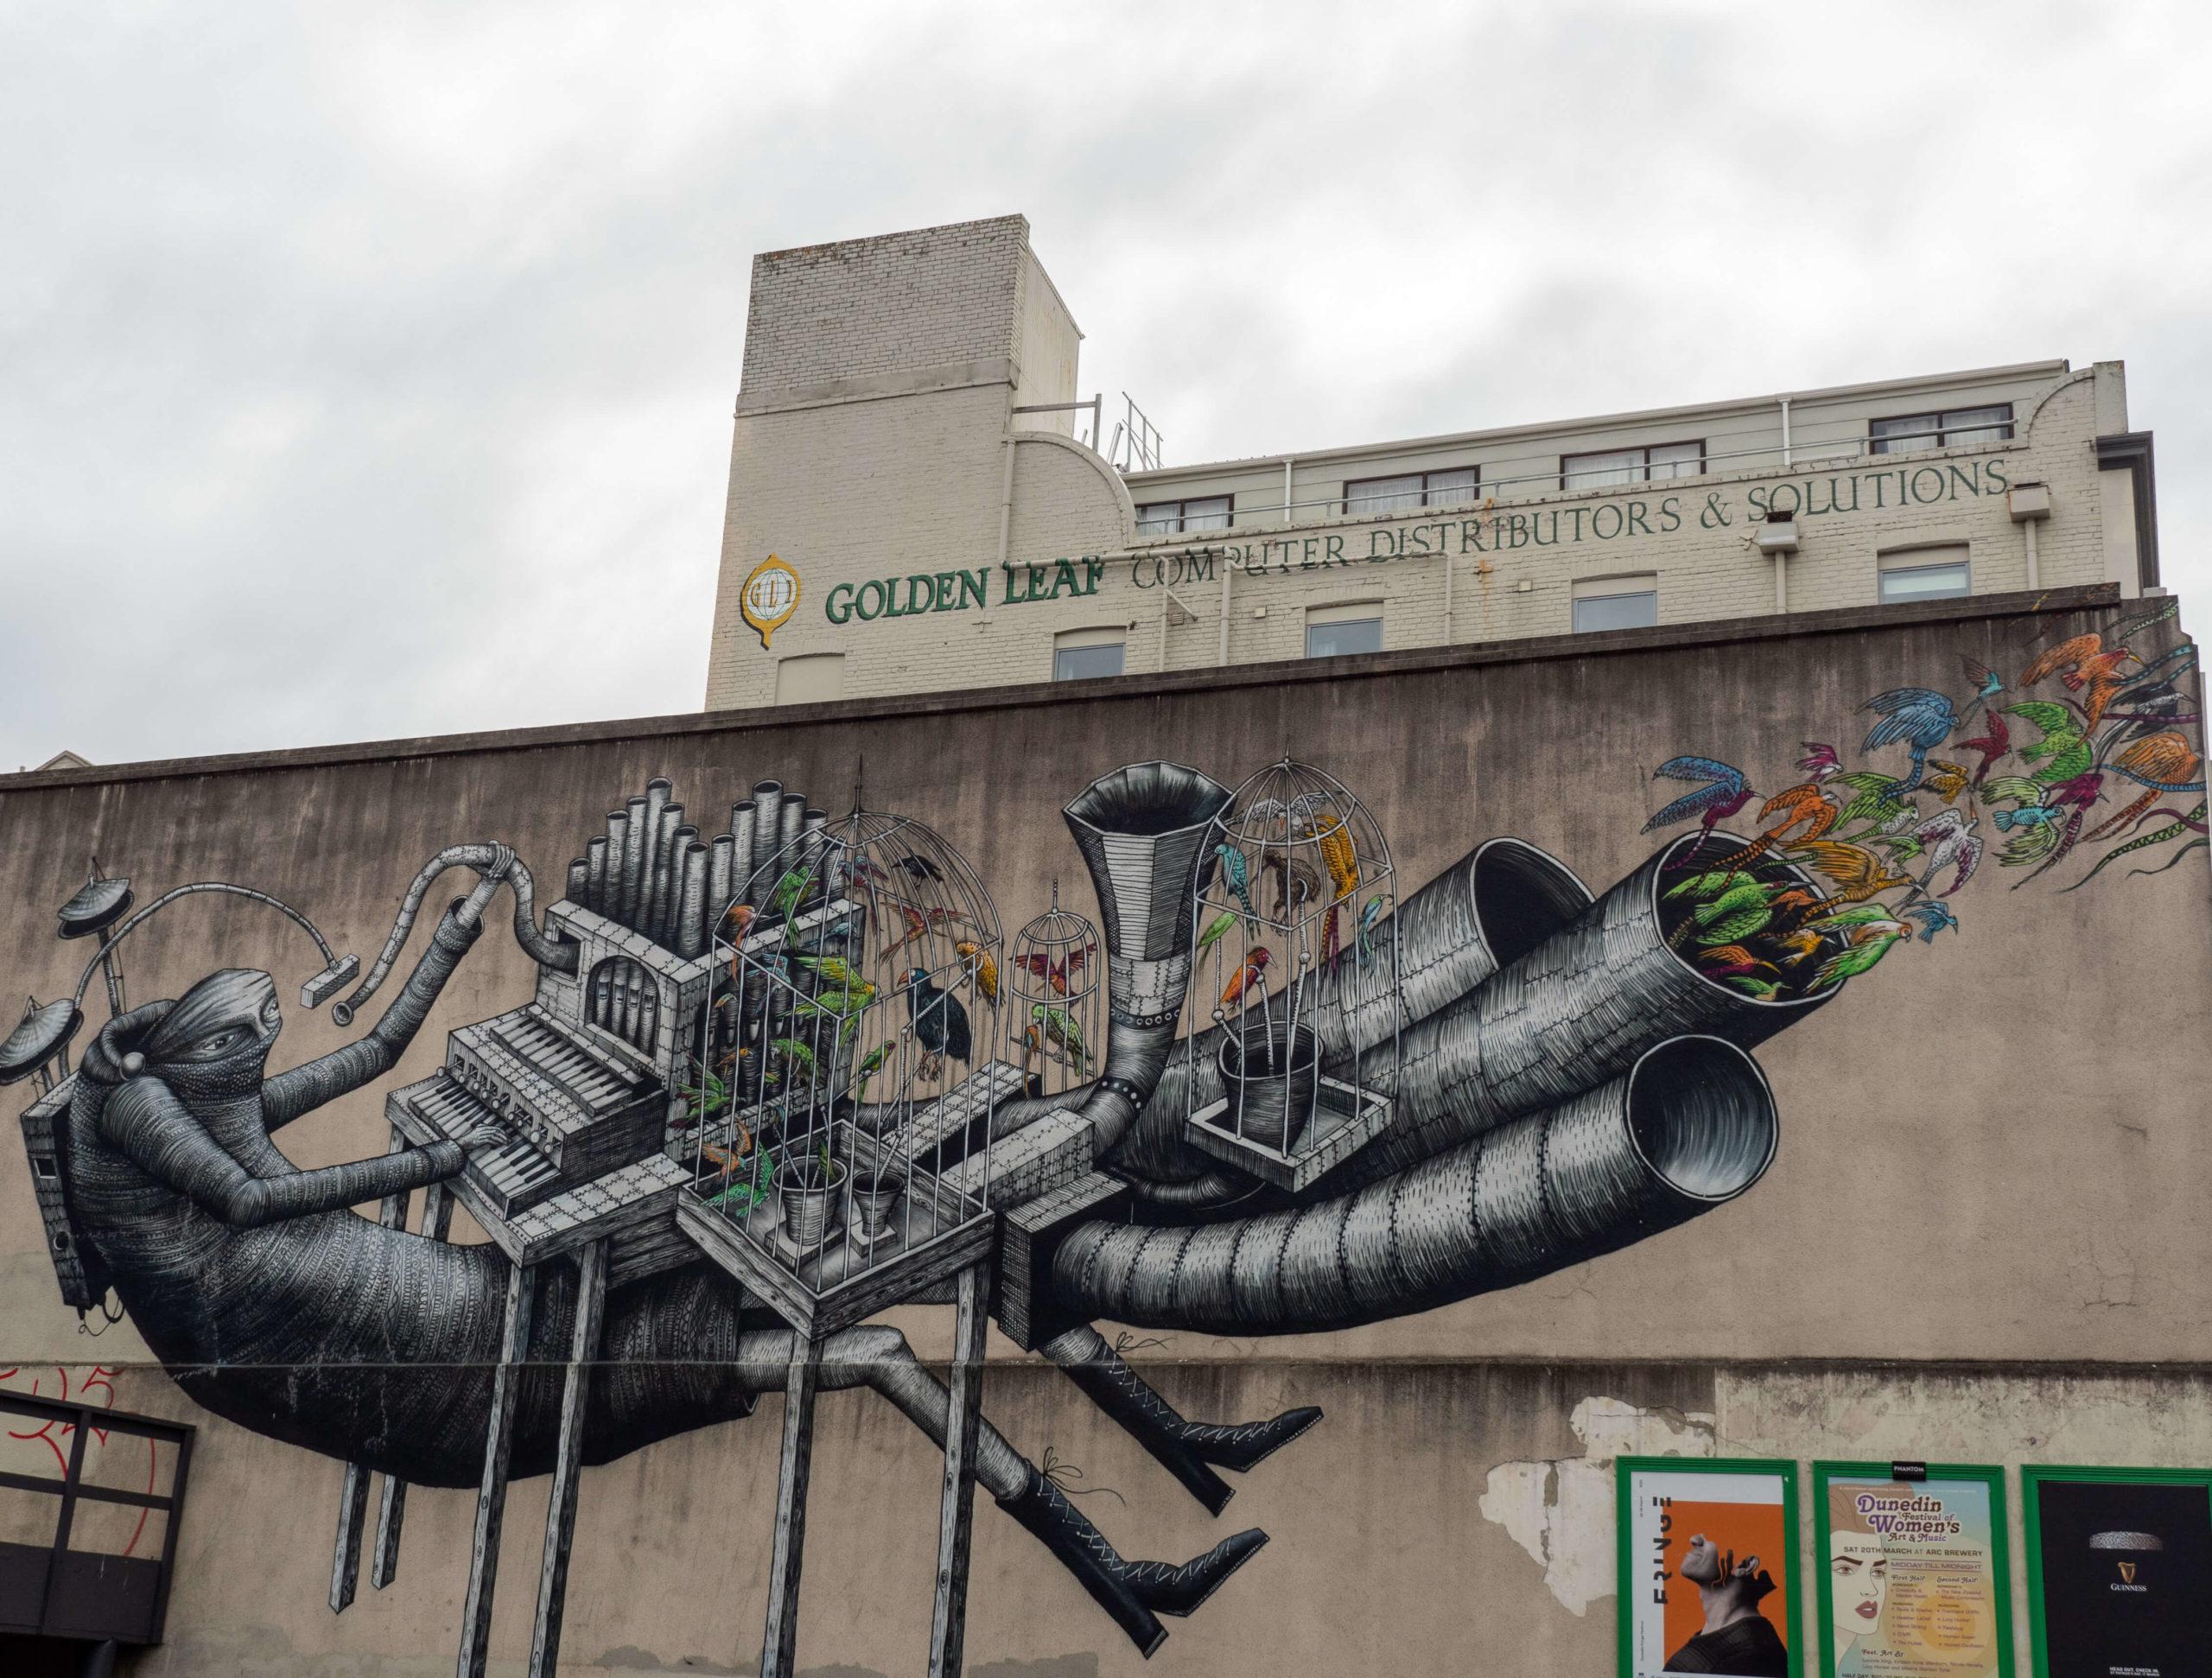 Musicien et oiseaux street art trail Dunedin